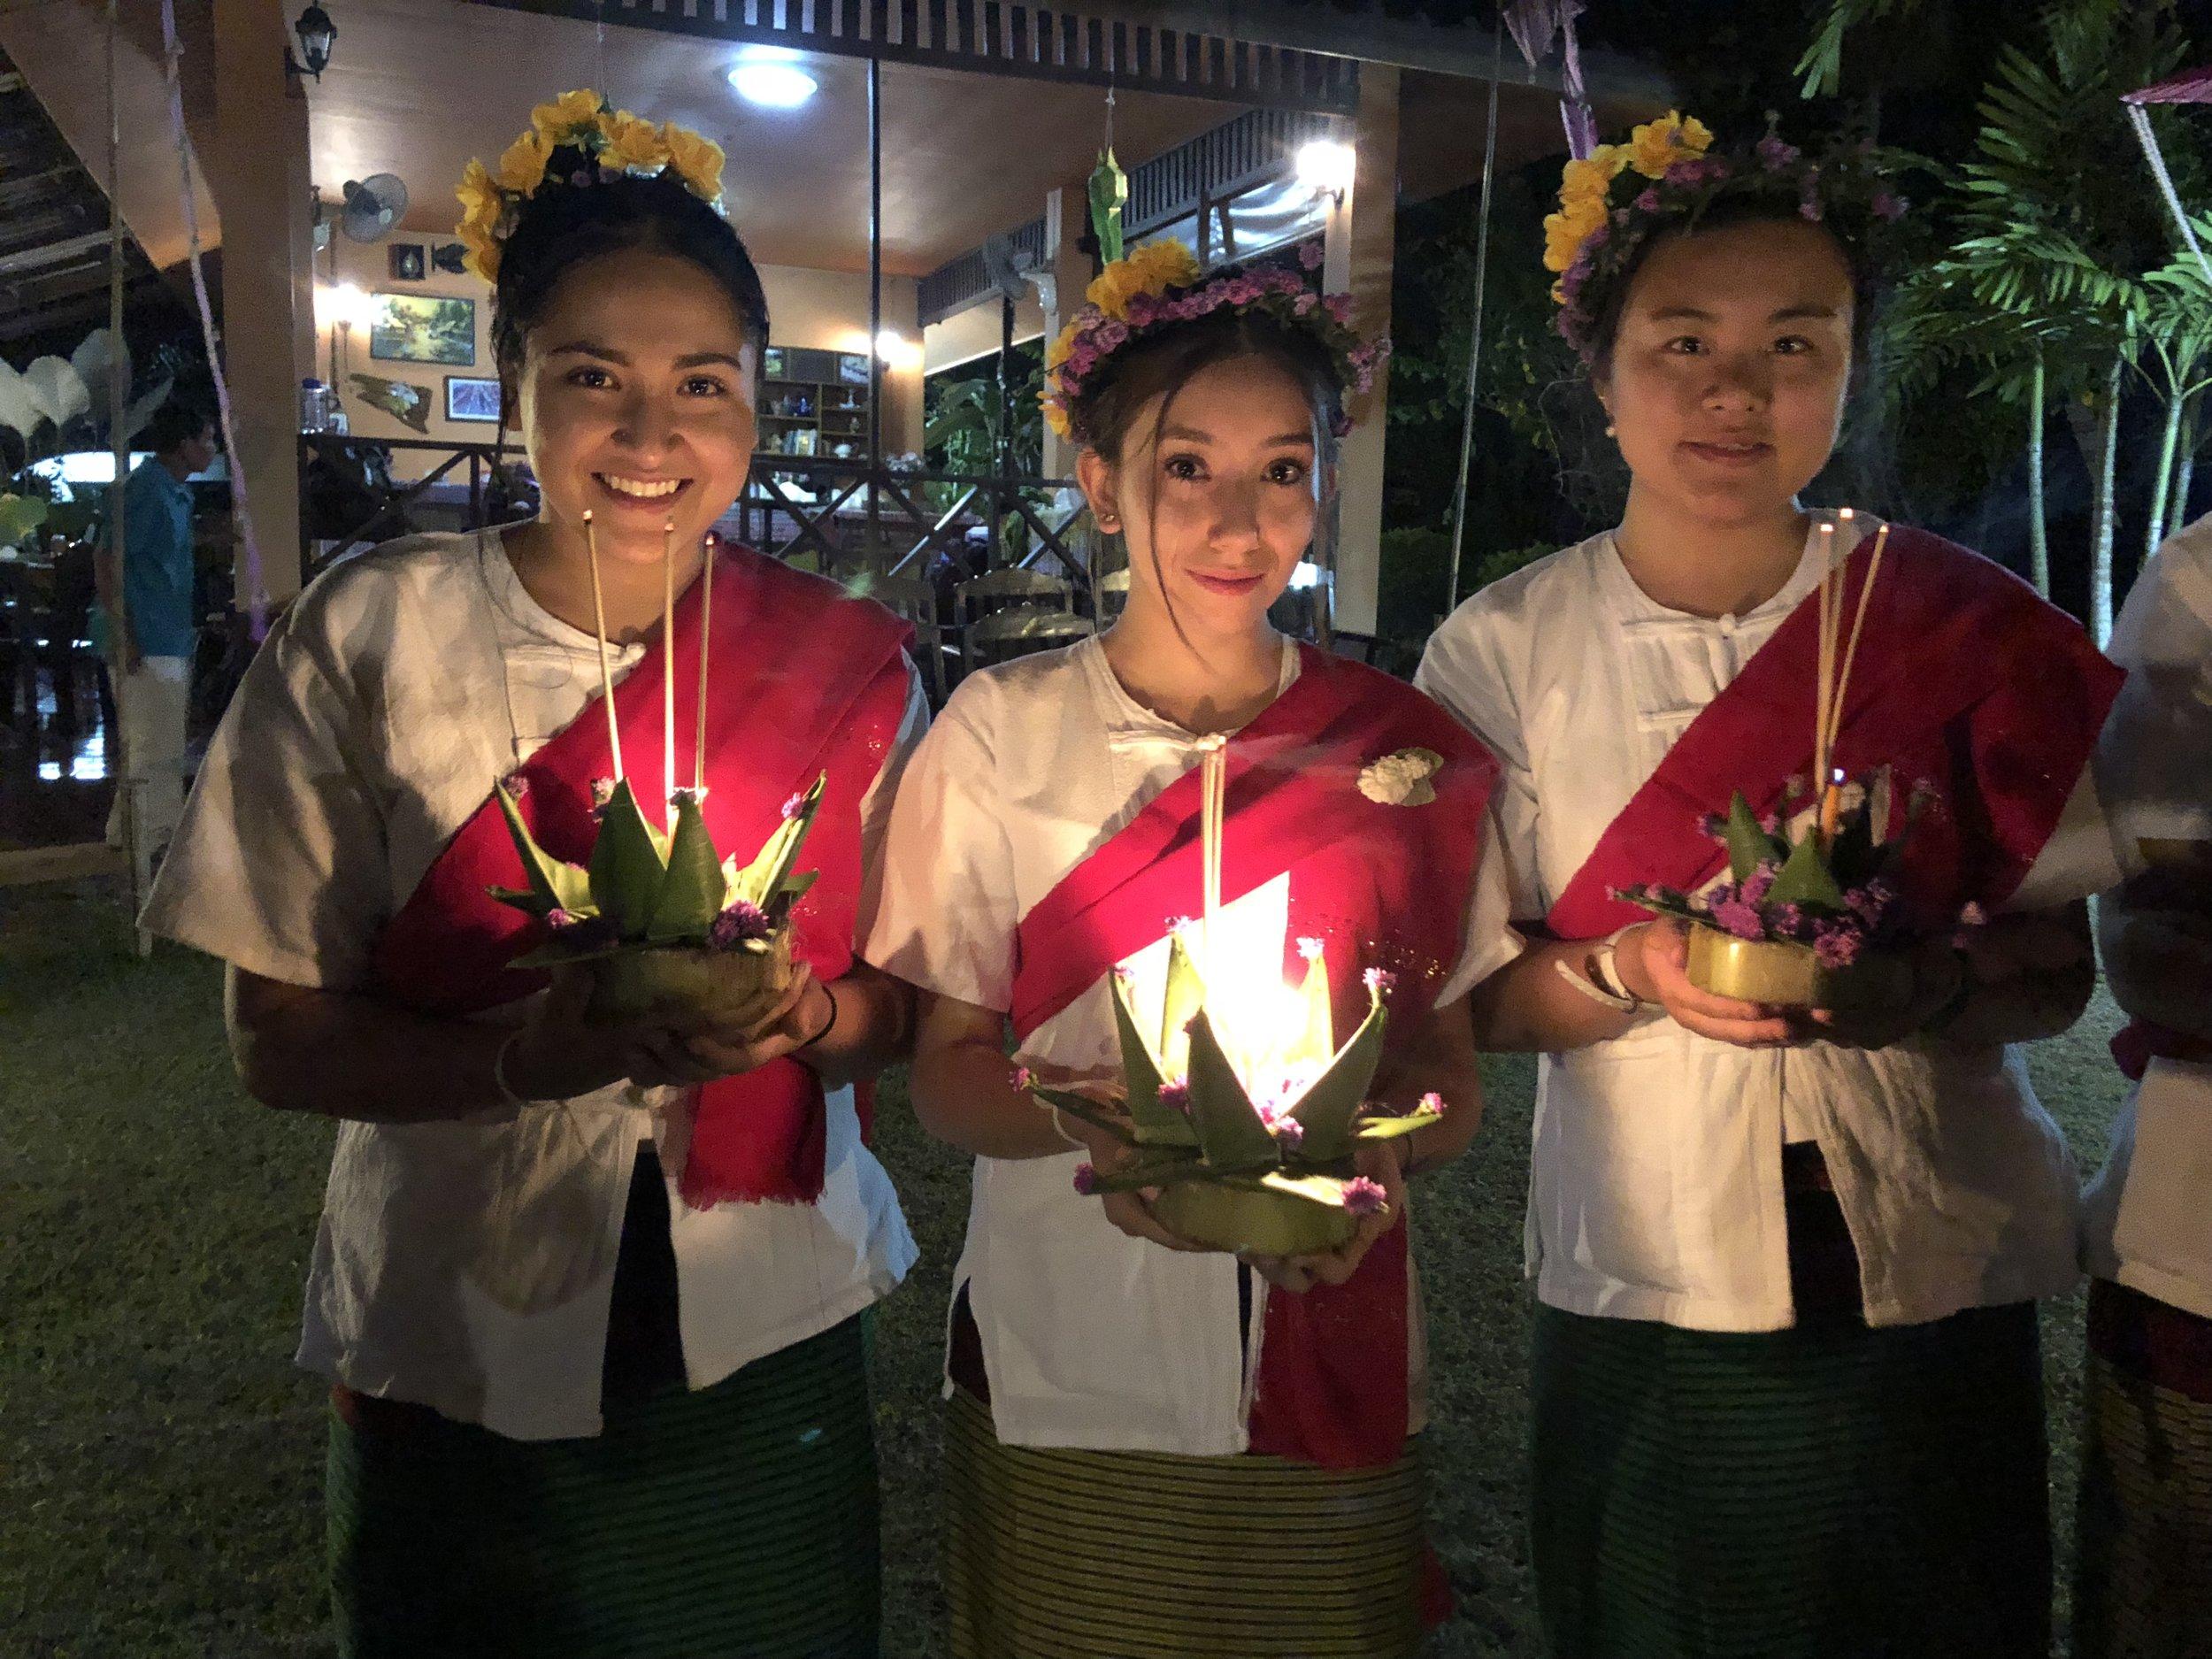 Cynthia, Ana, and Lena holding Loi Kratong lantern boats at the village farewell gathering.